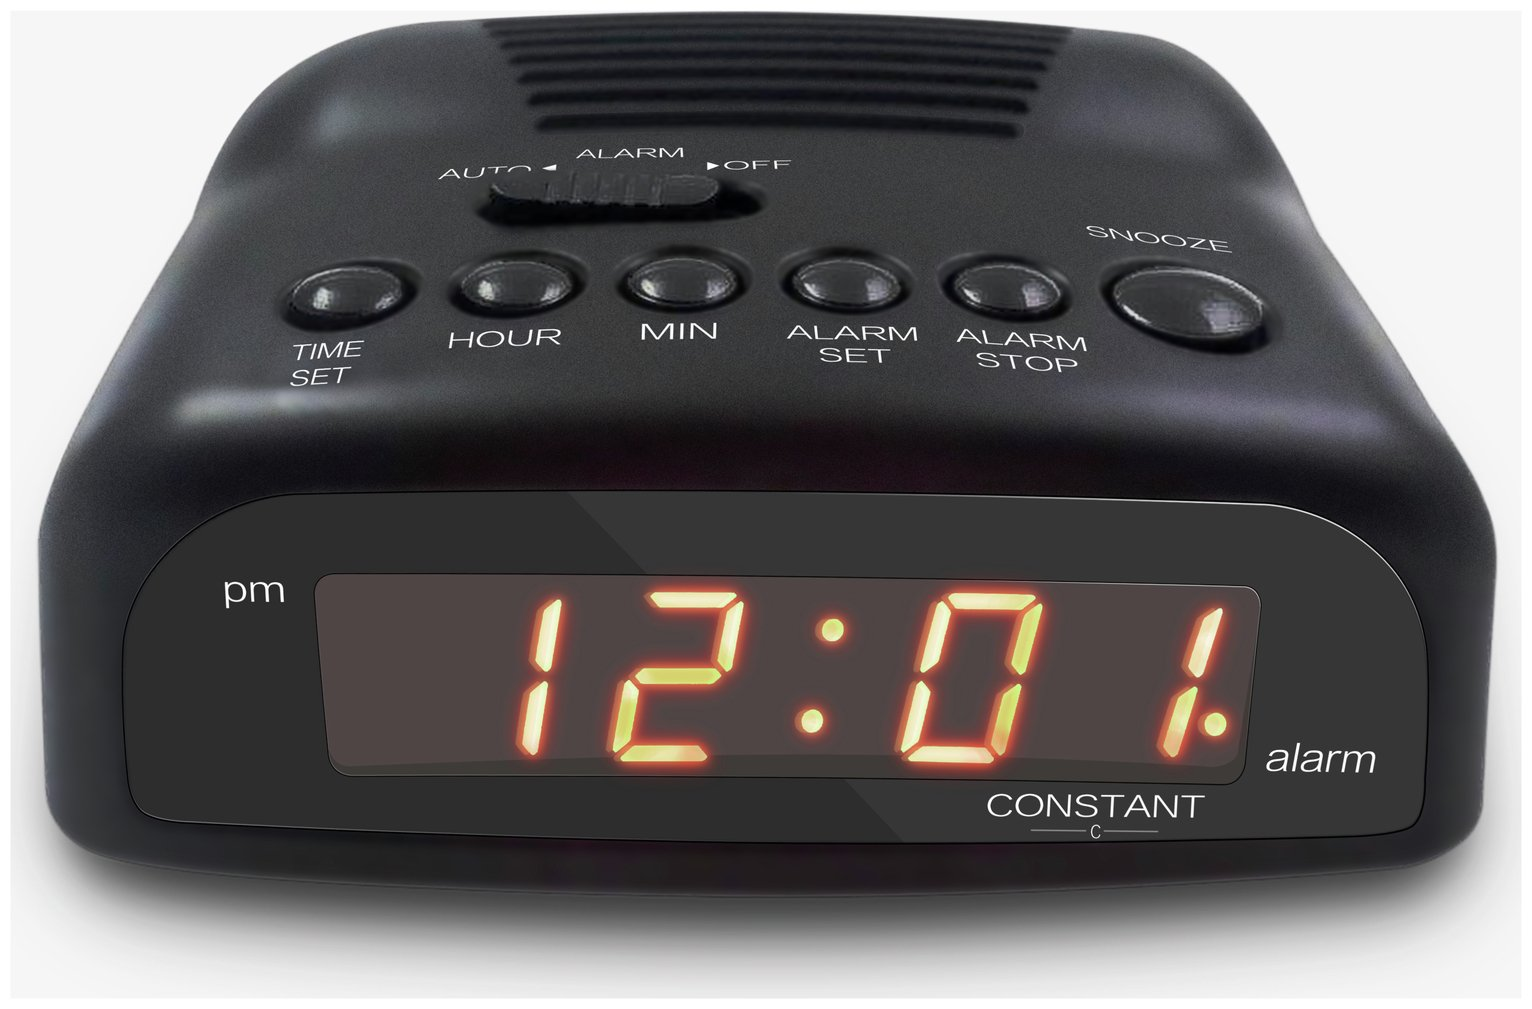 Image of Constant Digital Alarm Clock